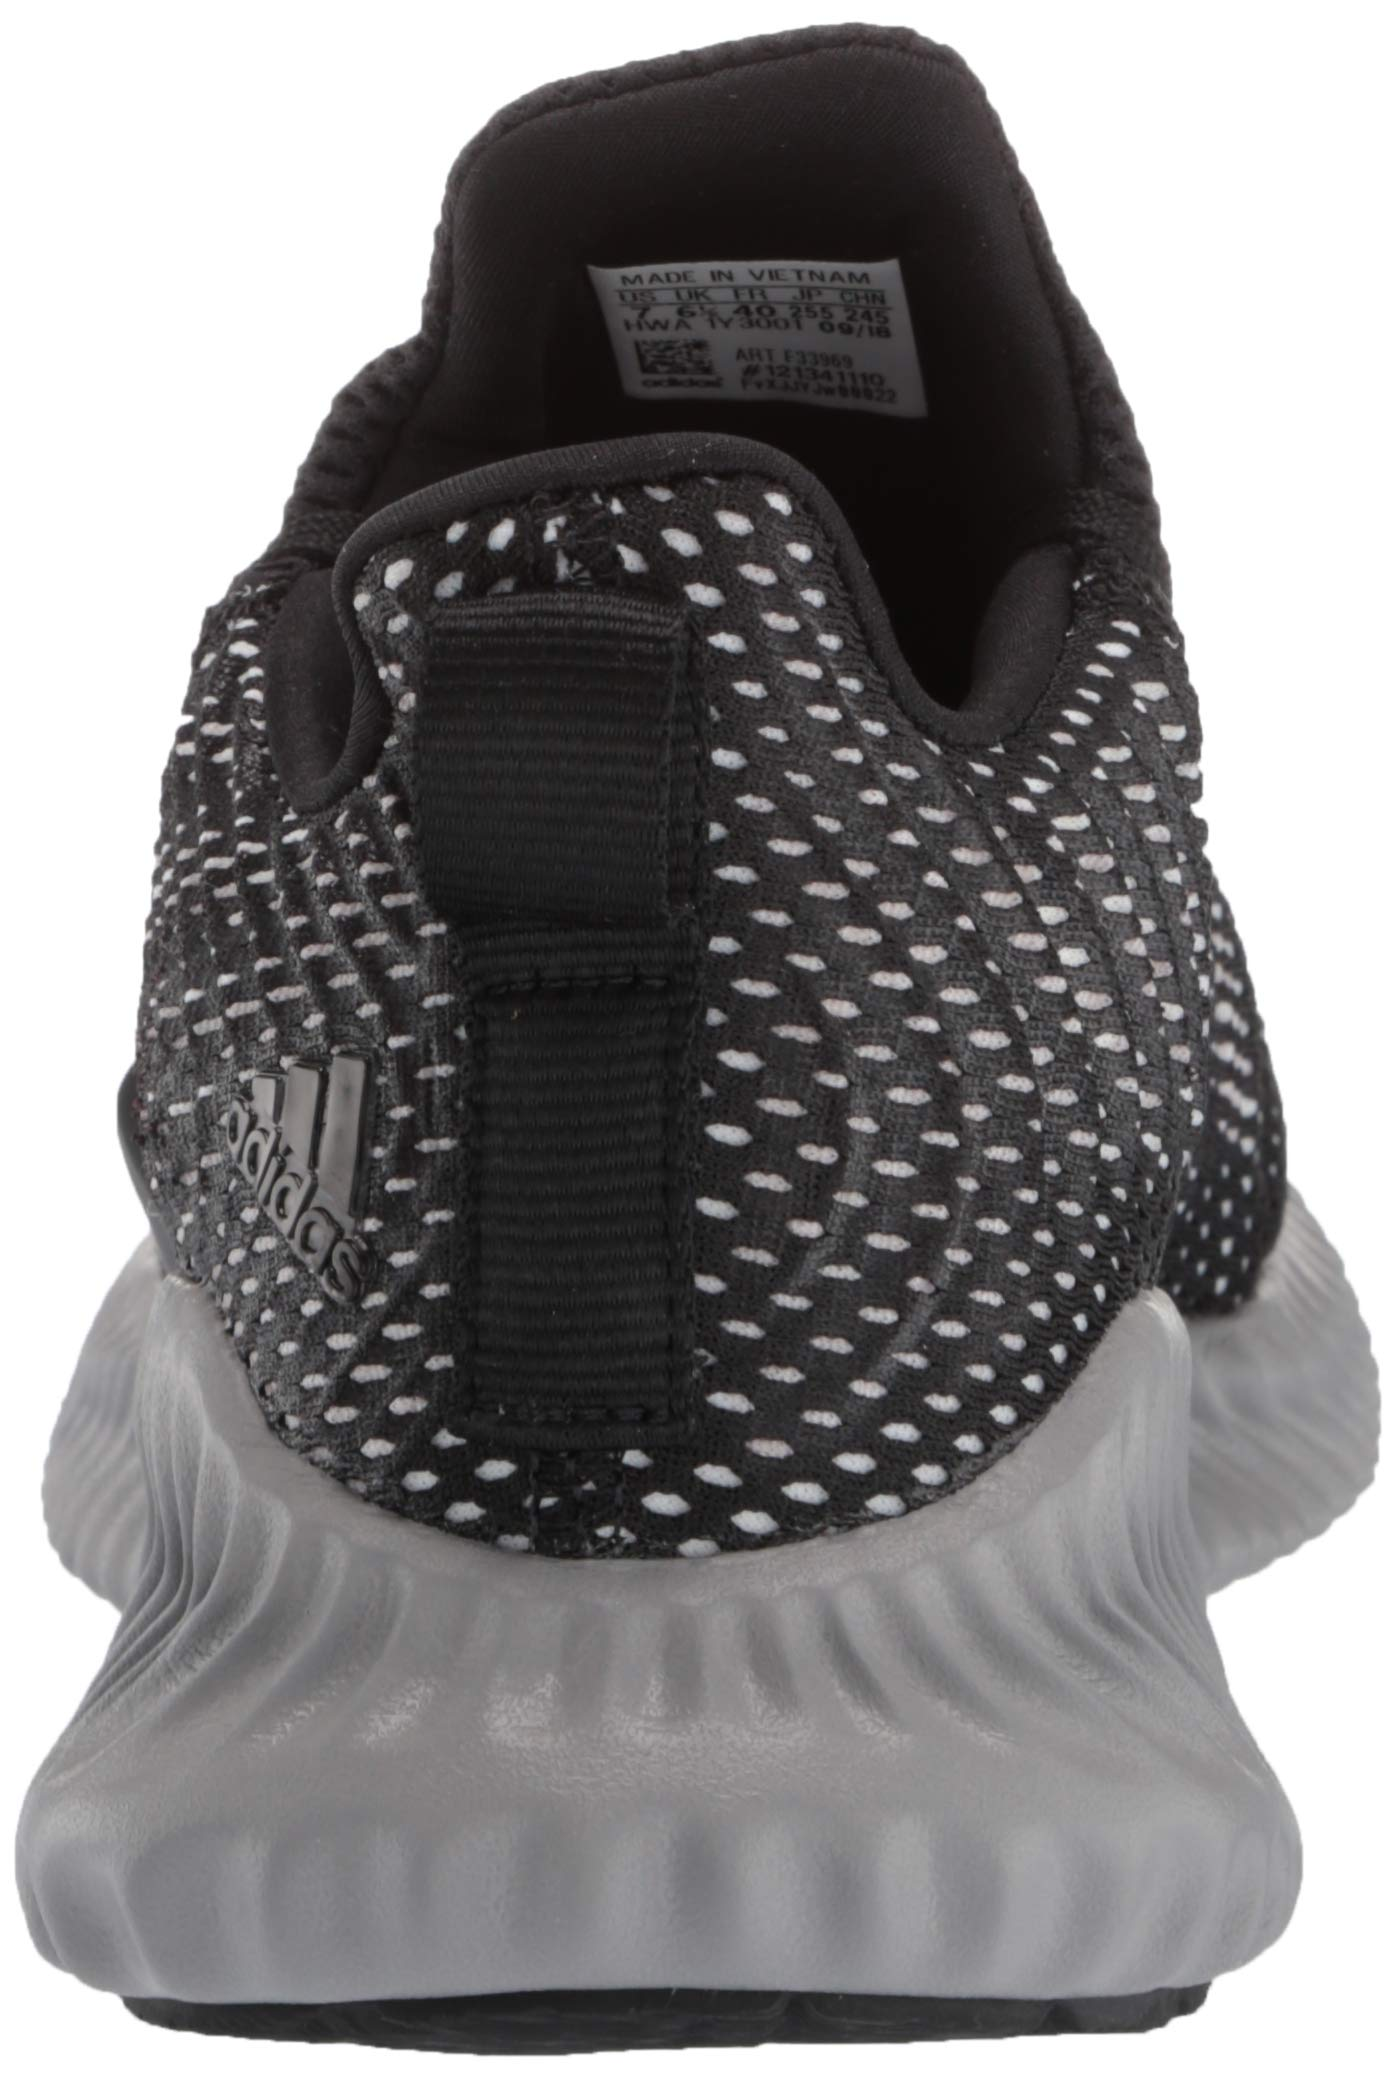 Adidas Kids Alphabounce Instinct, Black/White/Grey, 1 M US Little Kid by adidas (Image #2)